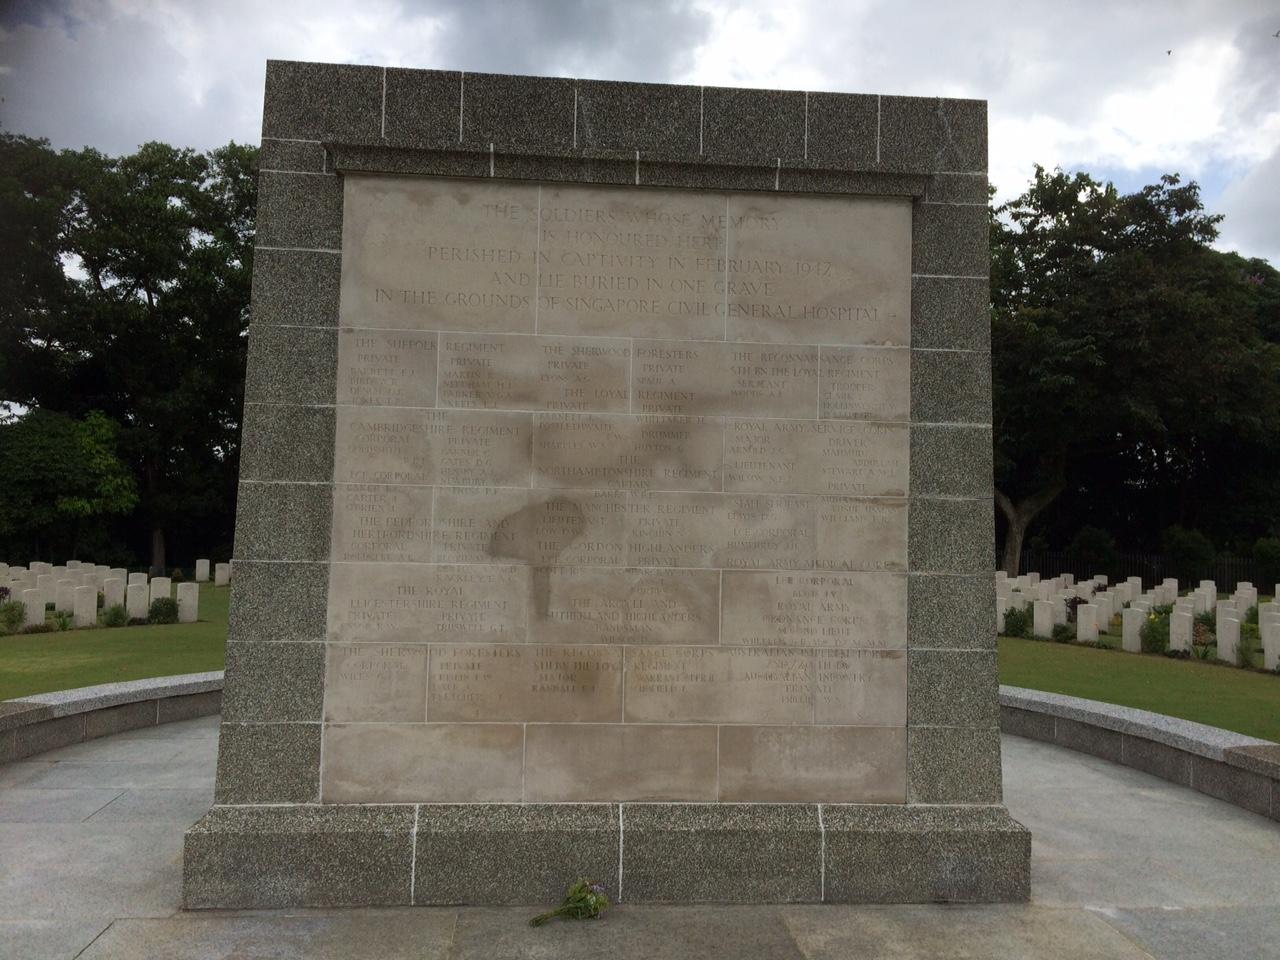 The Singapore Civil Hospital Grave Memorial